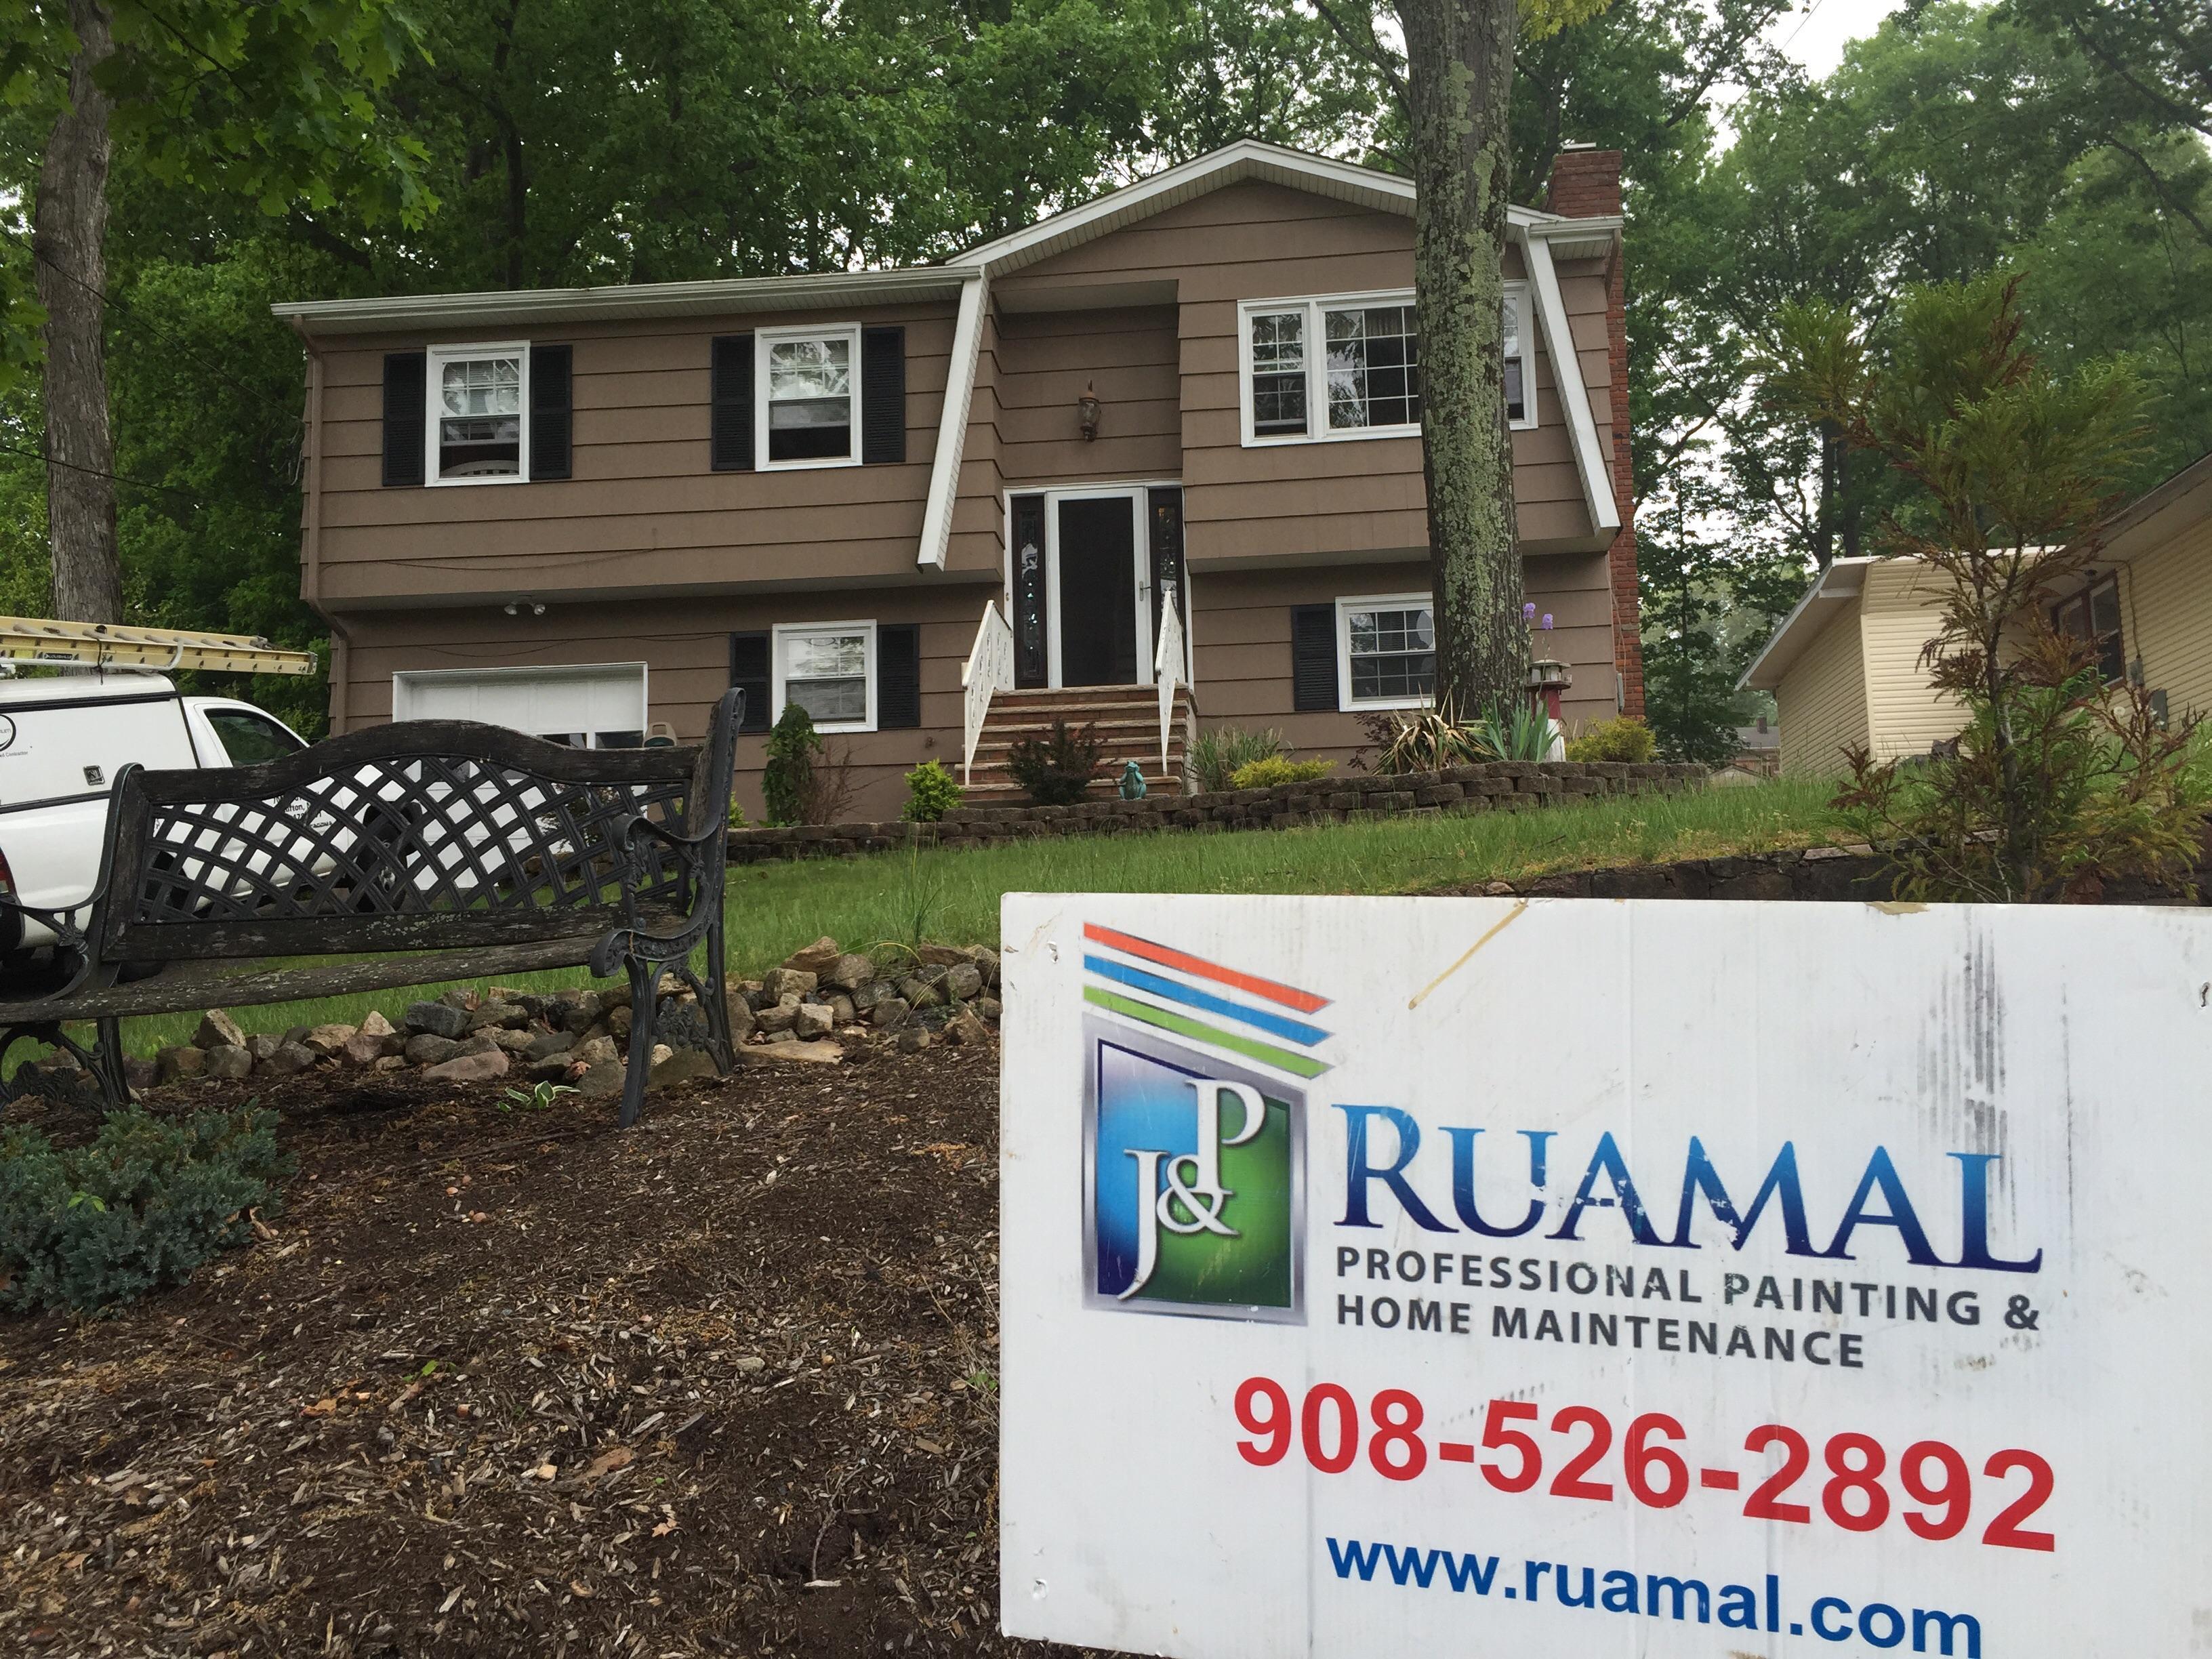 Ruamal Painting And Home Maintenance LLC image 3